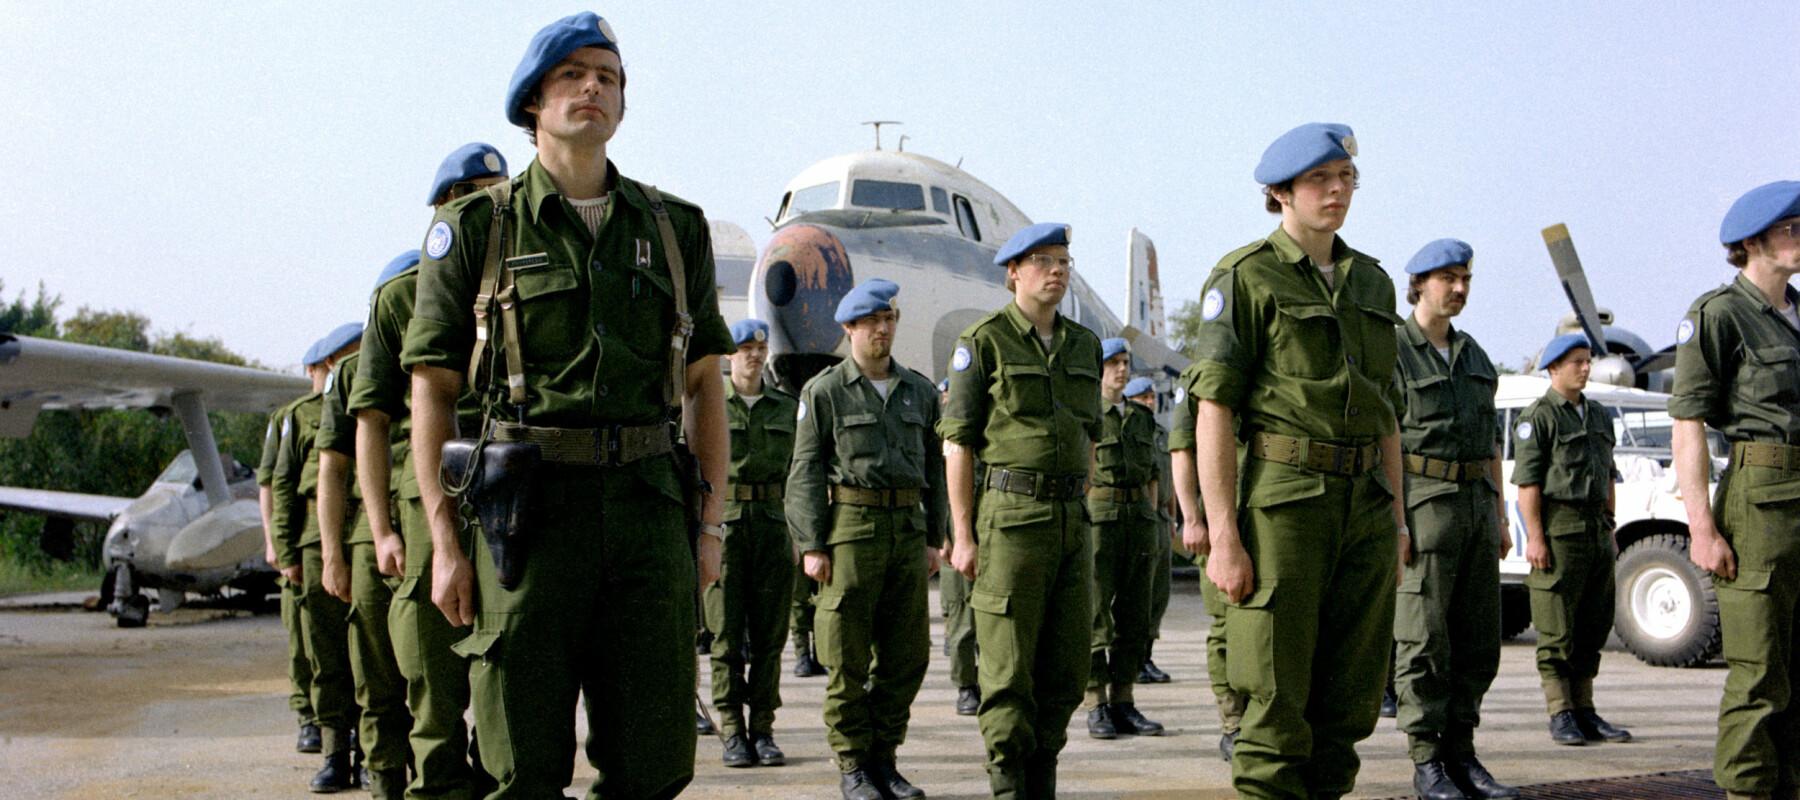 norske fn soldater fra norbatt's f¿rste kontingent under oppstilling pŒ beirut flyplass i 1978  norwegian un soldiers at beirut airport 1978